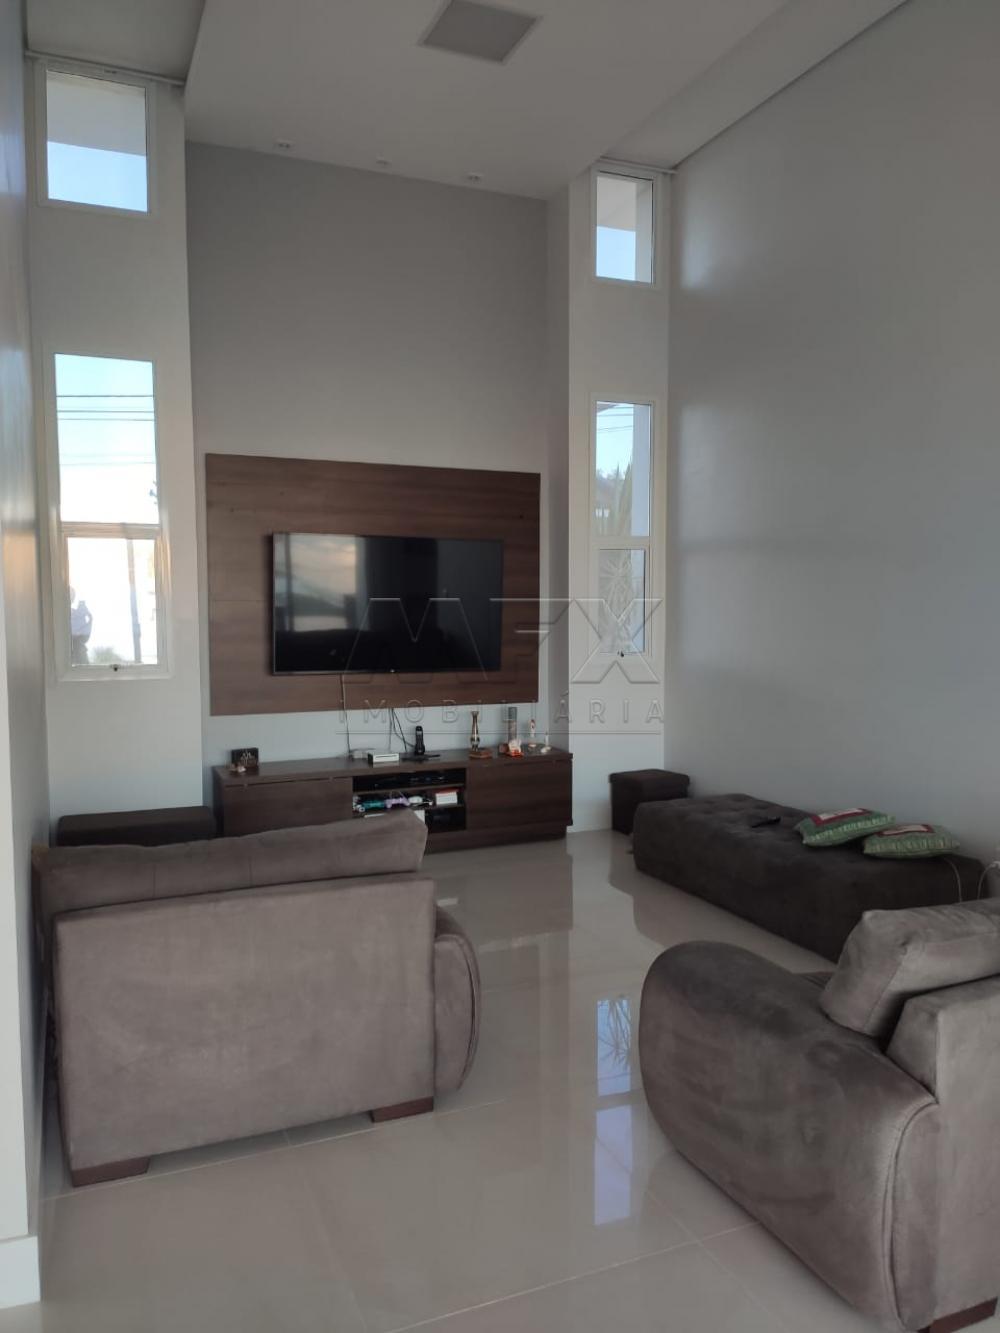 Comprar Casa / Condomínio em Bauru apenas R$ 1.800.000,00 - Foto 14